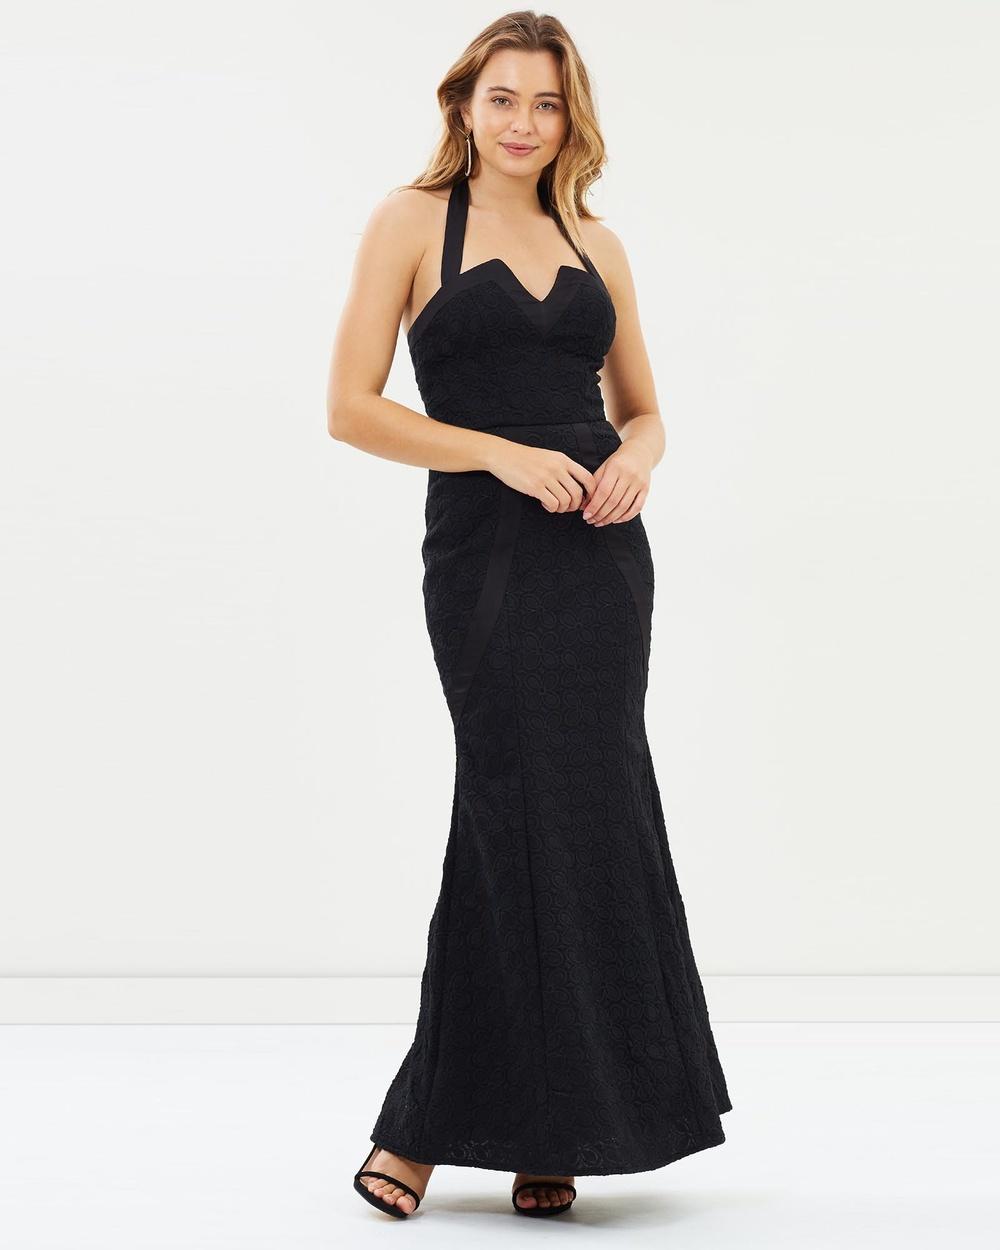 Romance by Honey and Beau Jessica Halter Maxi Dress Dresses Black Jessica Halter Maxi Dress